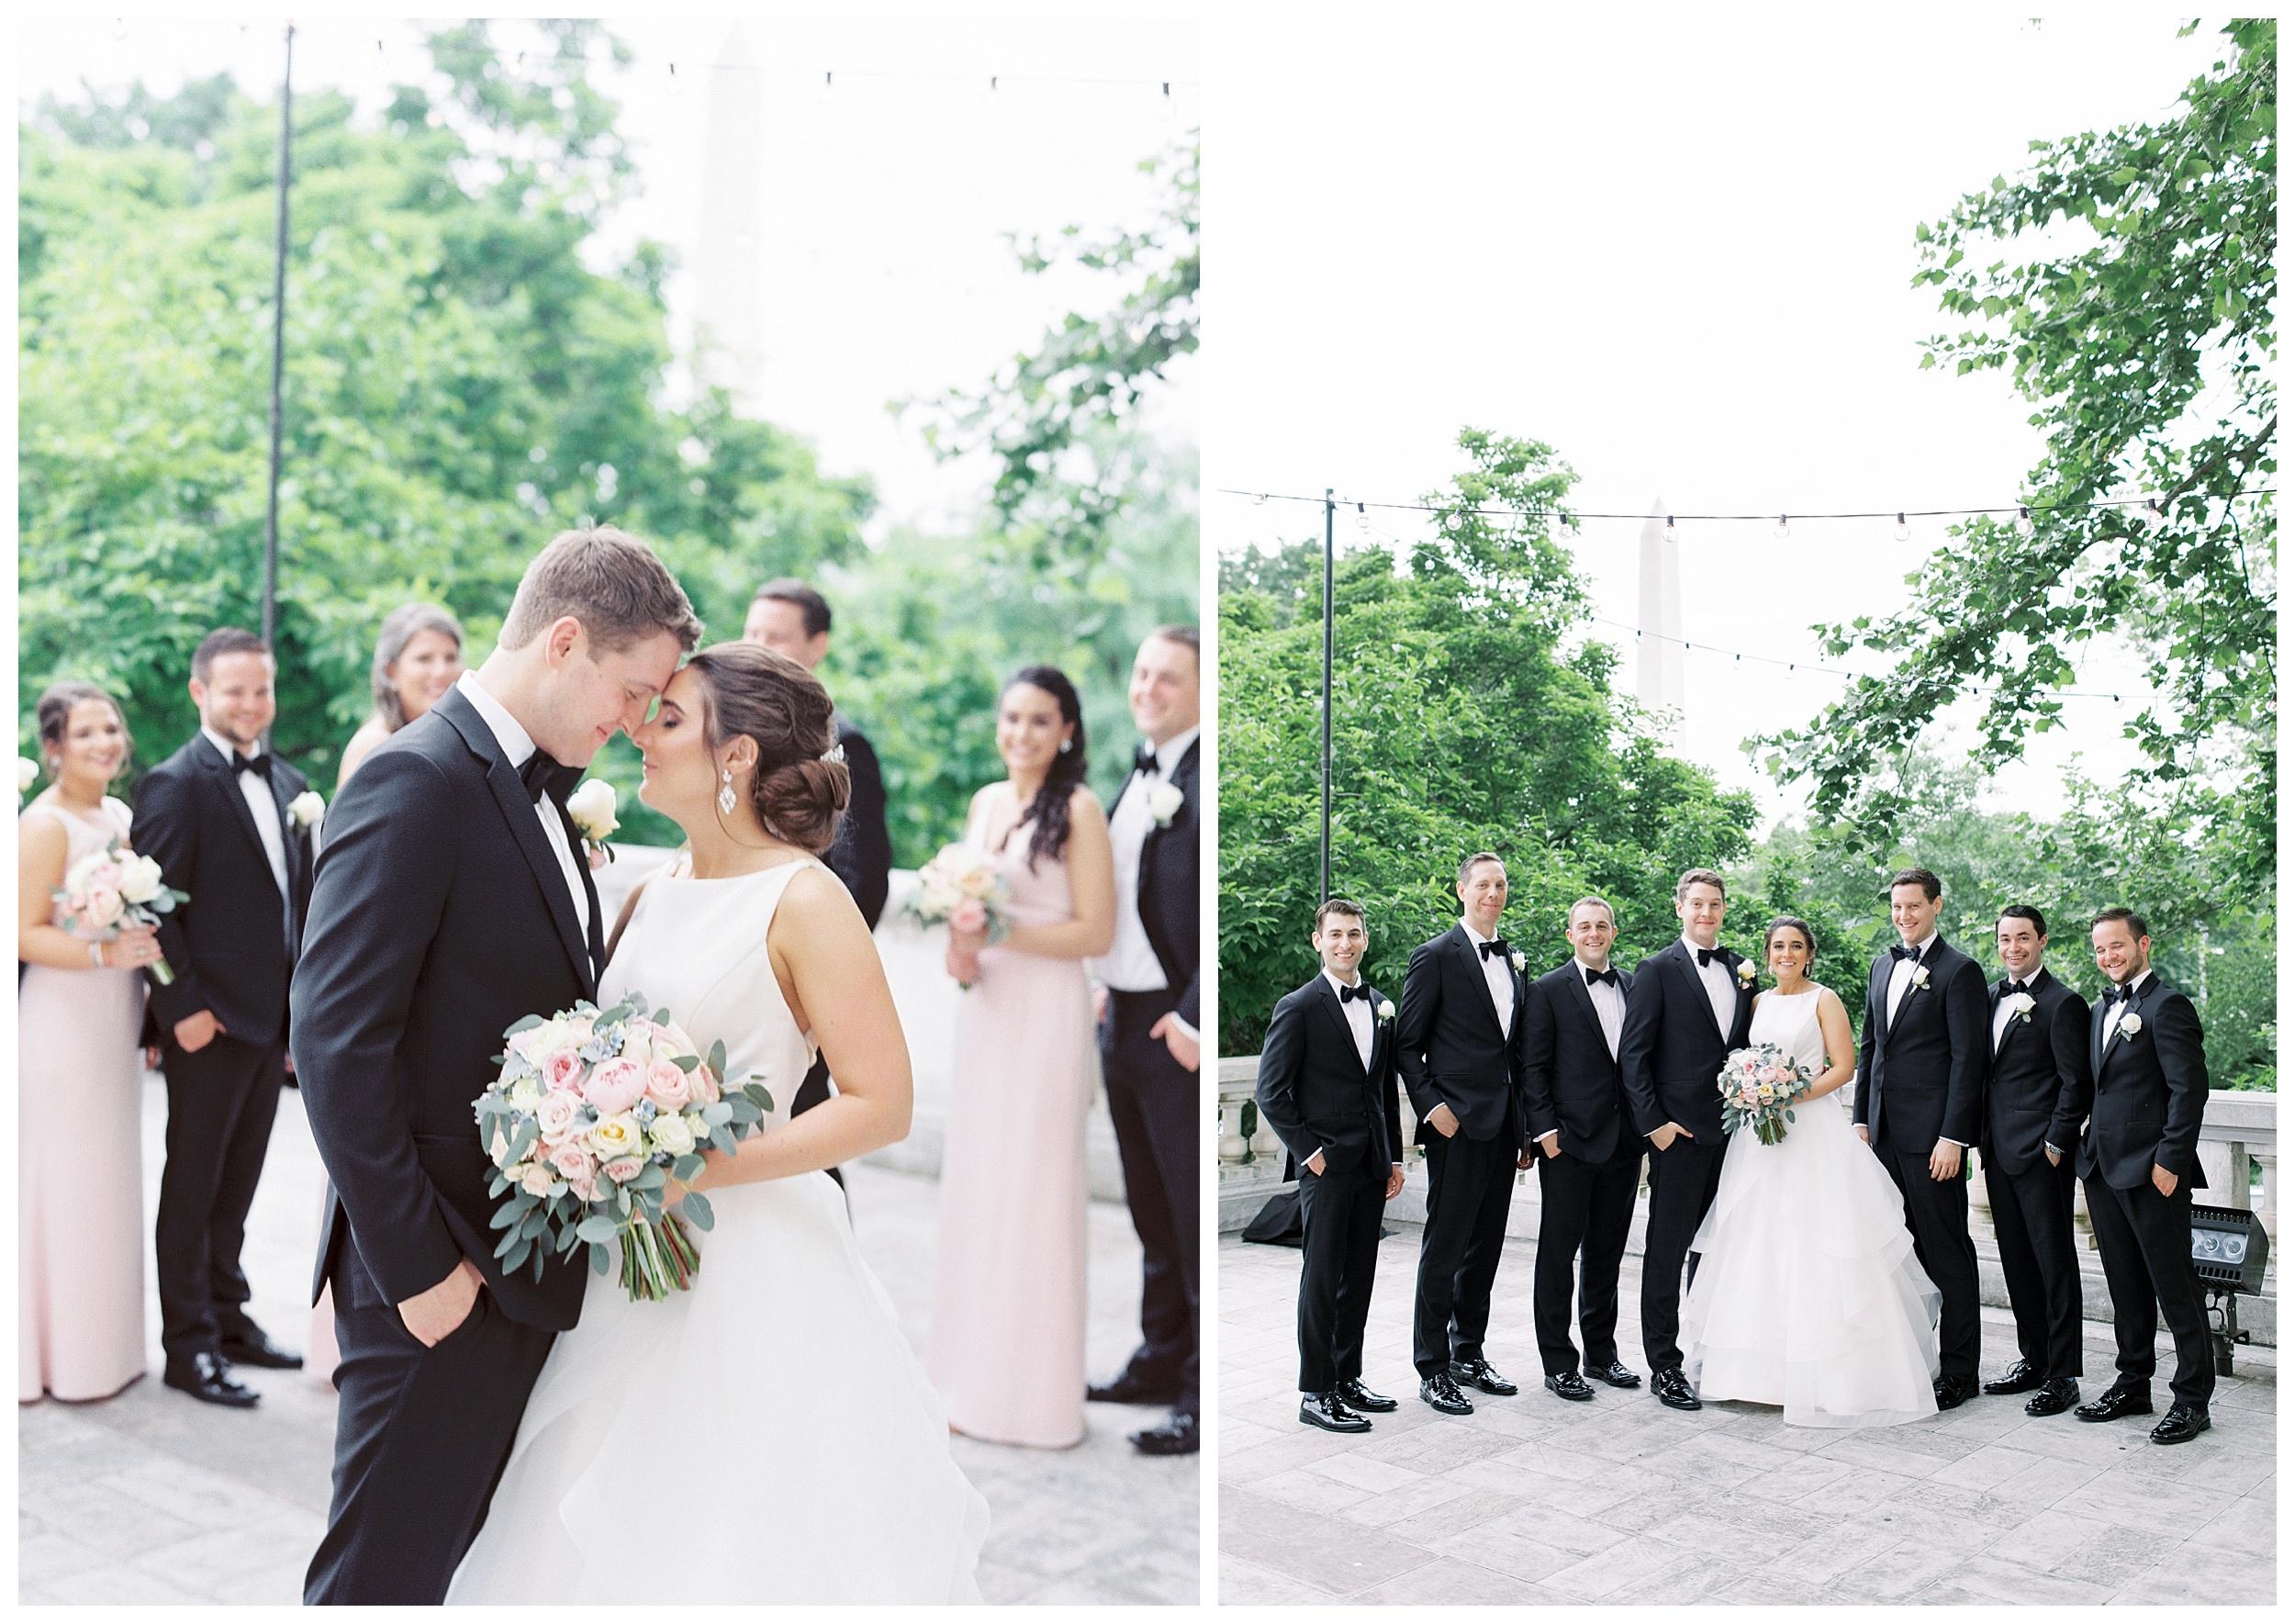 DAR Constitution Hall Wedding Wedding | Daughters of the American Revolution Wedding | District of Columbia Film Wedding Photographer Kir Tuben_0078.jpg